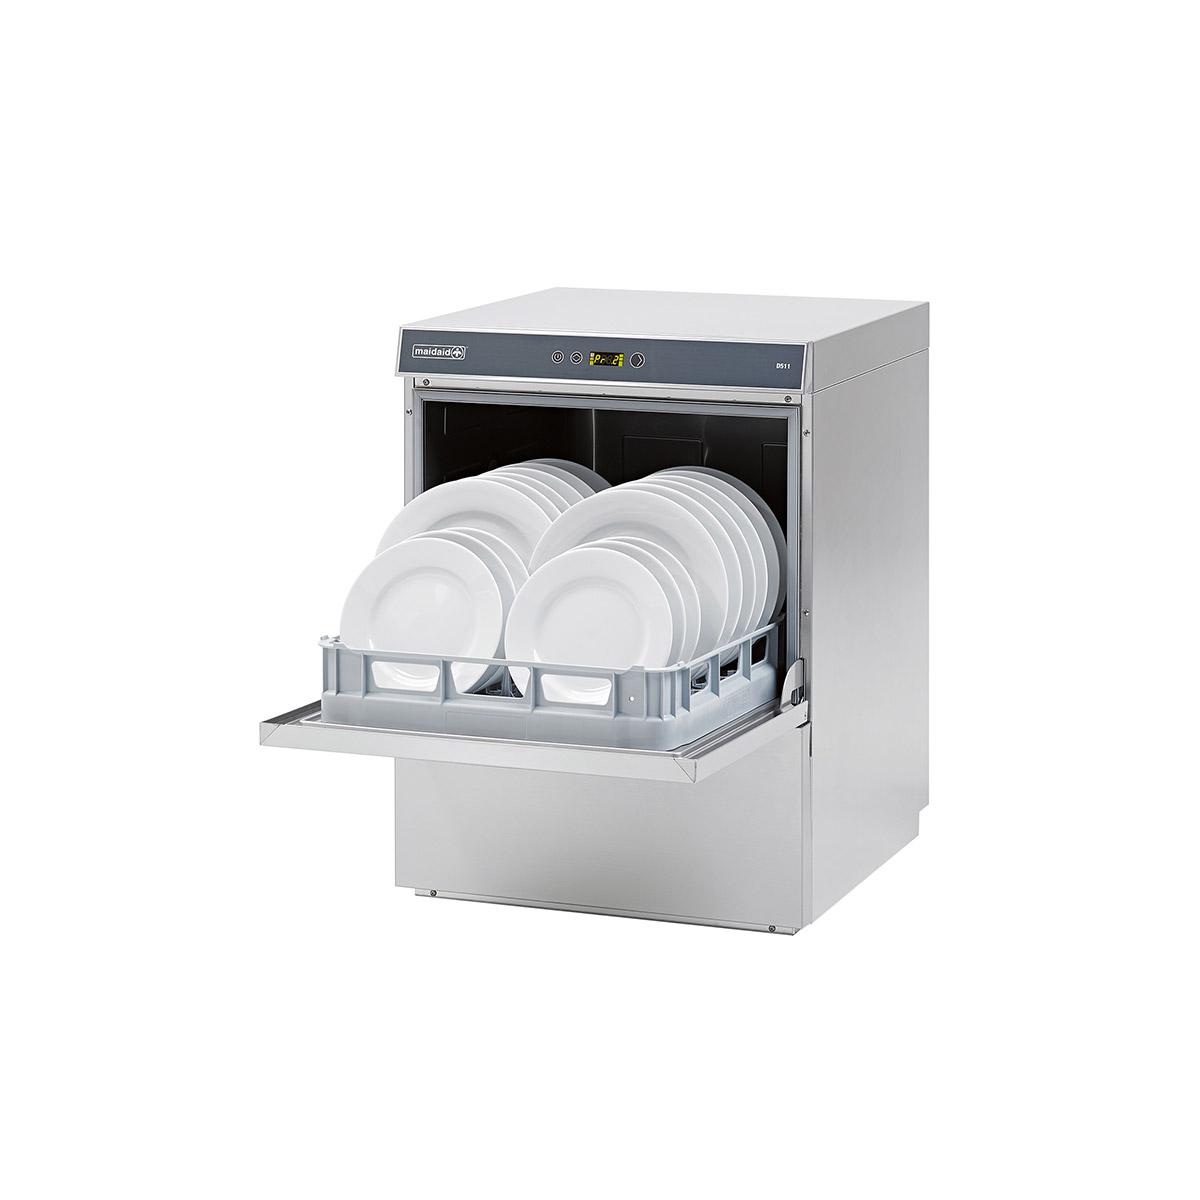 Maidaid Halcyon Dishwasher D511